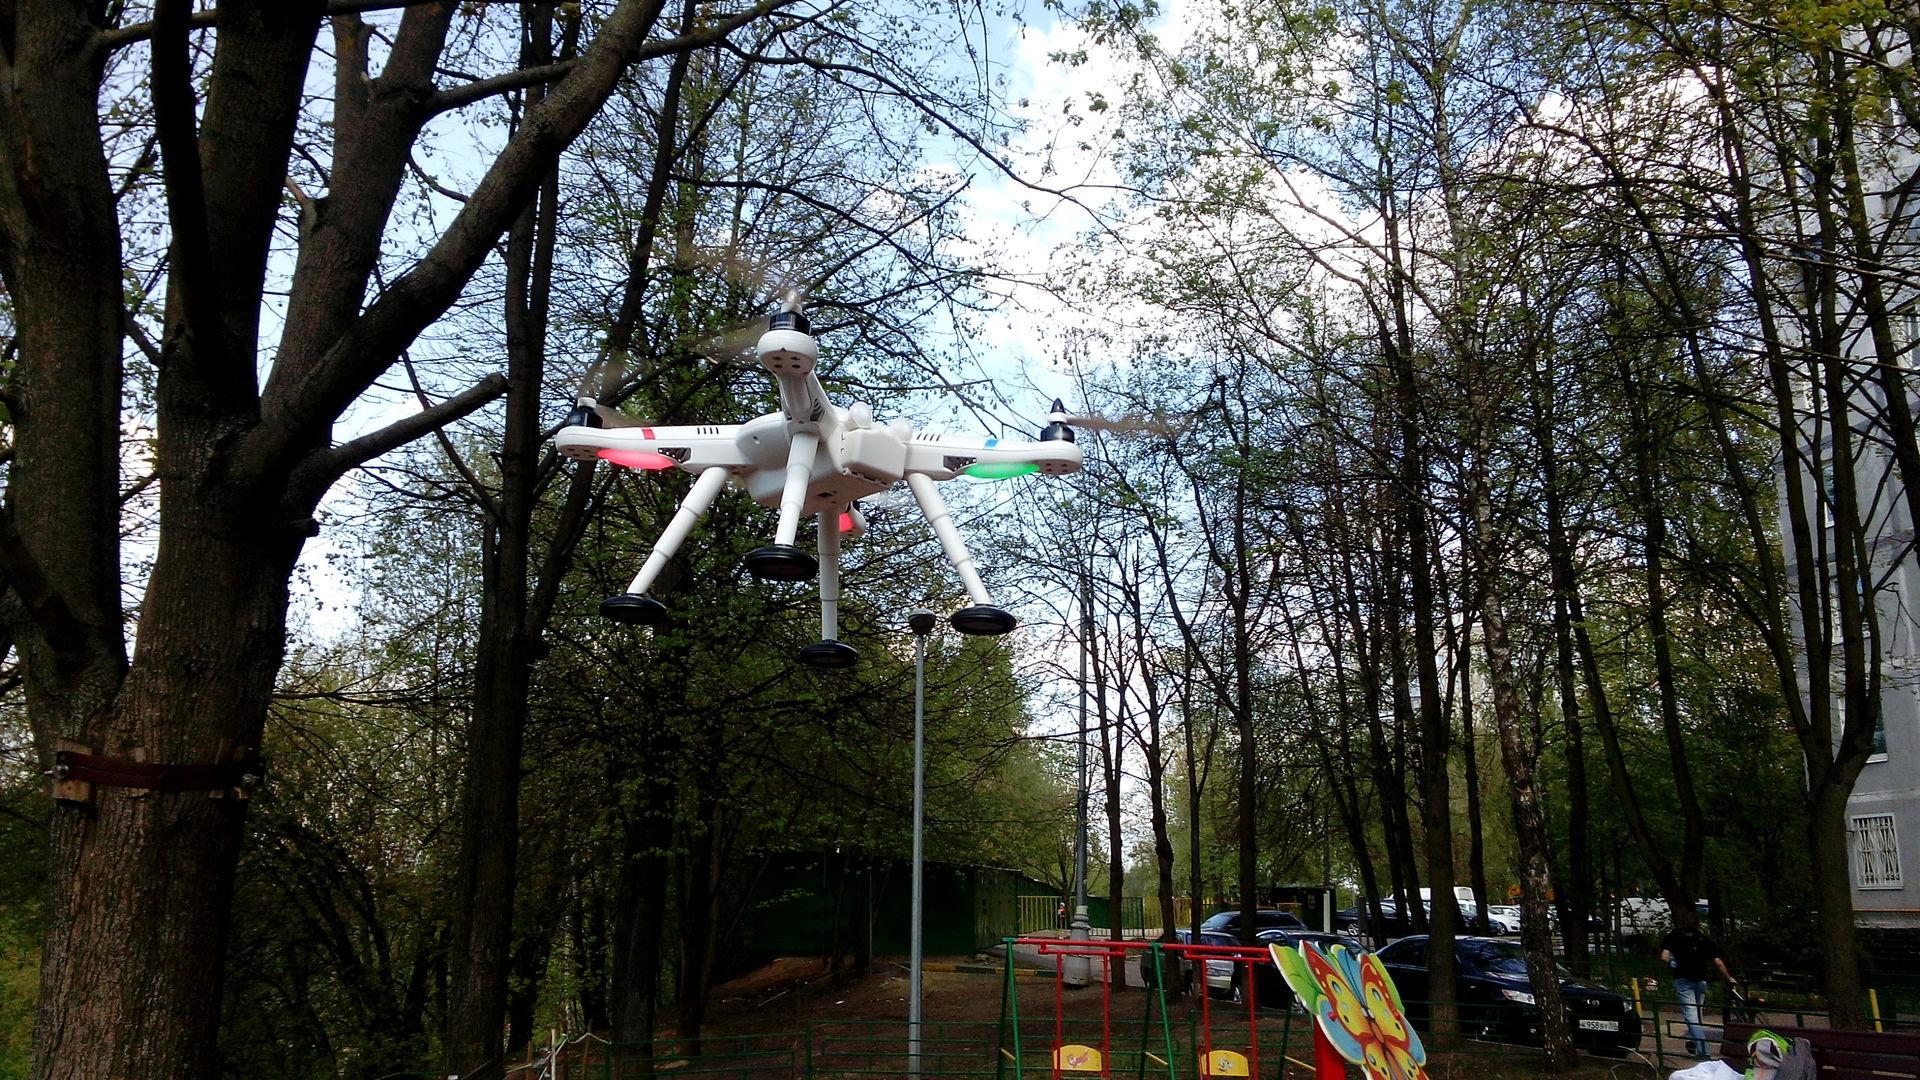 Квадрокоптер для GoPro глазами девушки — Wltoys v303 - 6